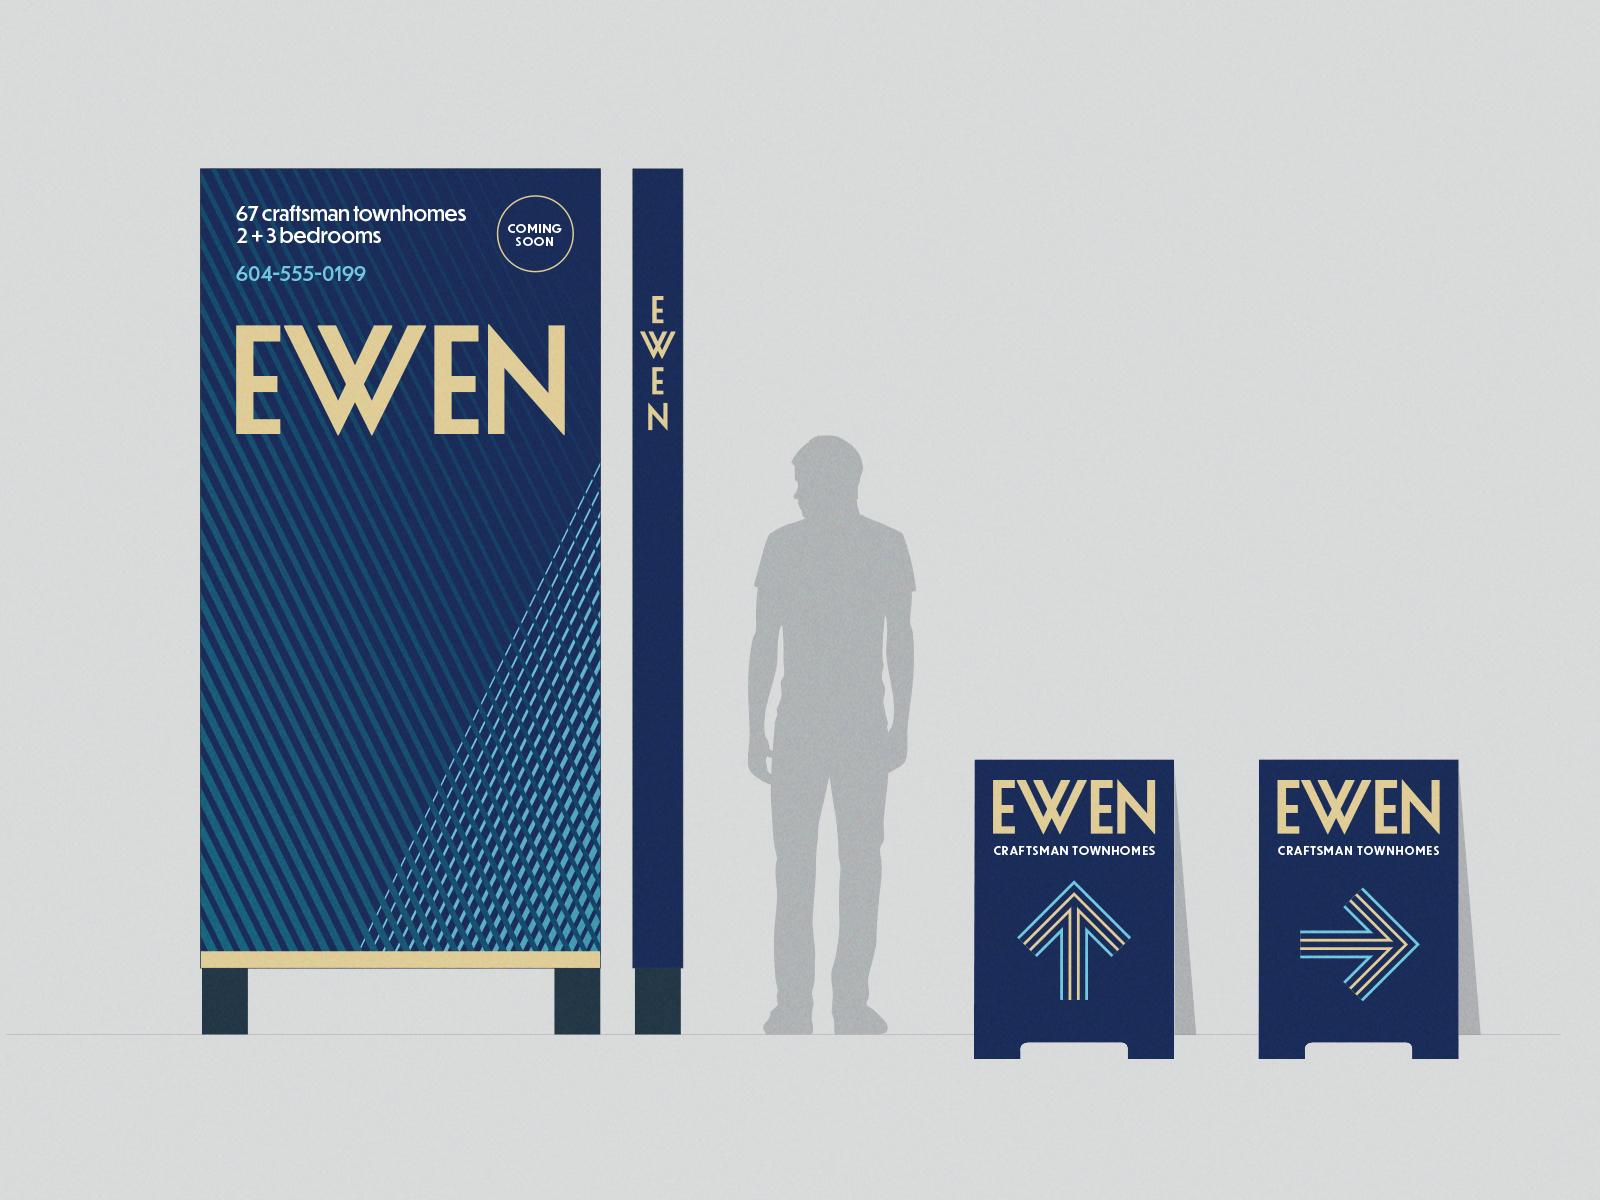 HM_Docs_Identities_ewen2.jpg